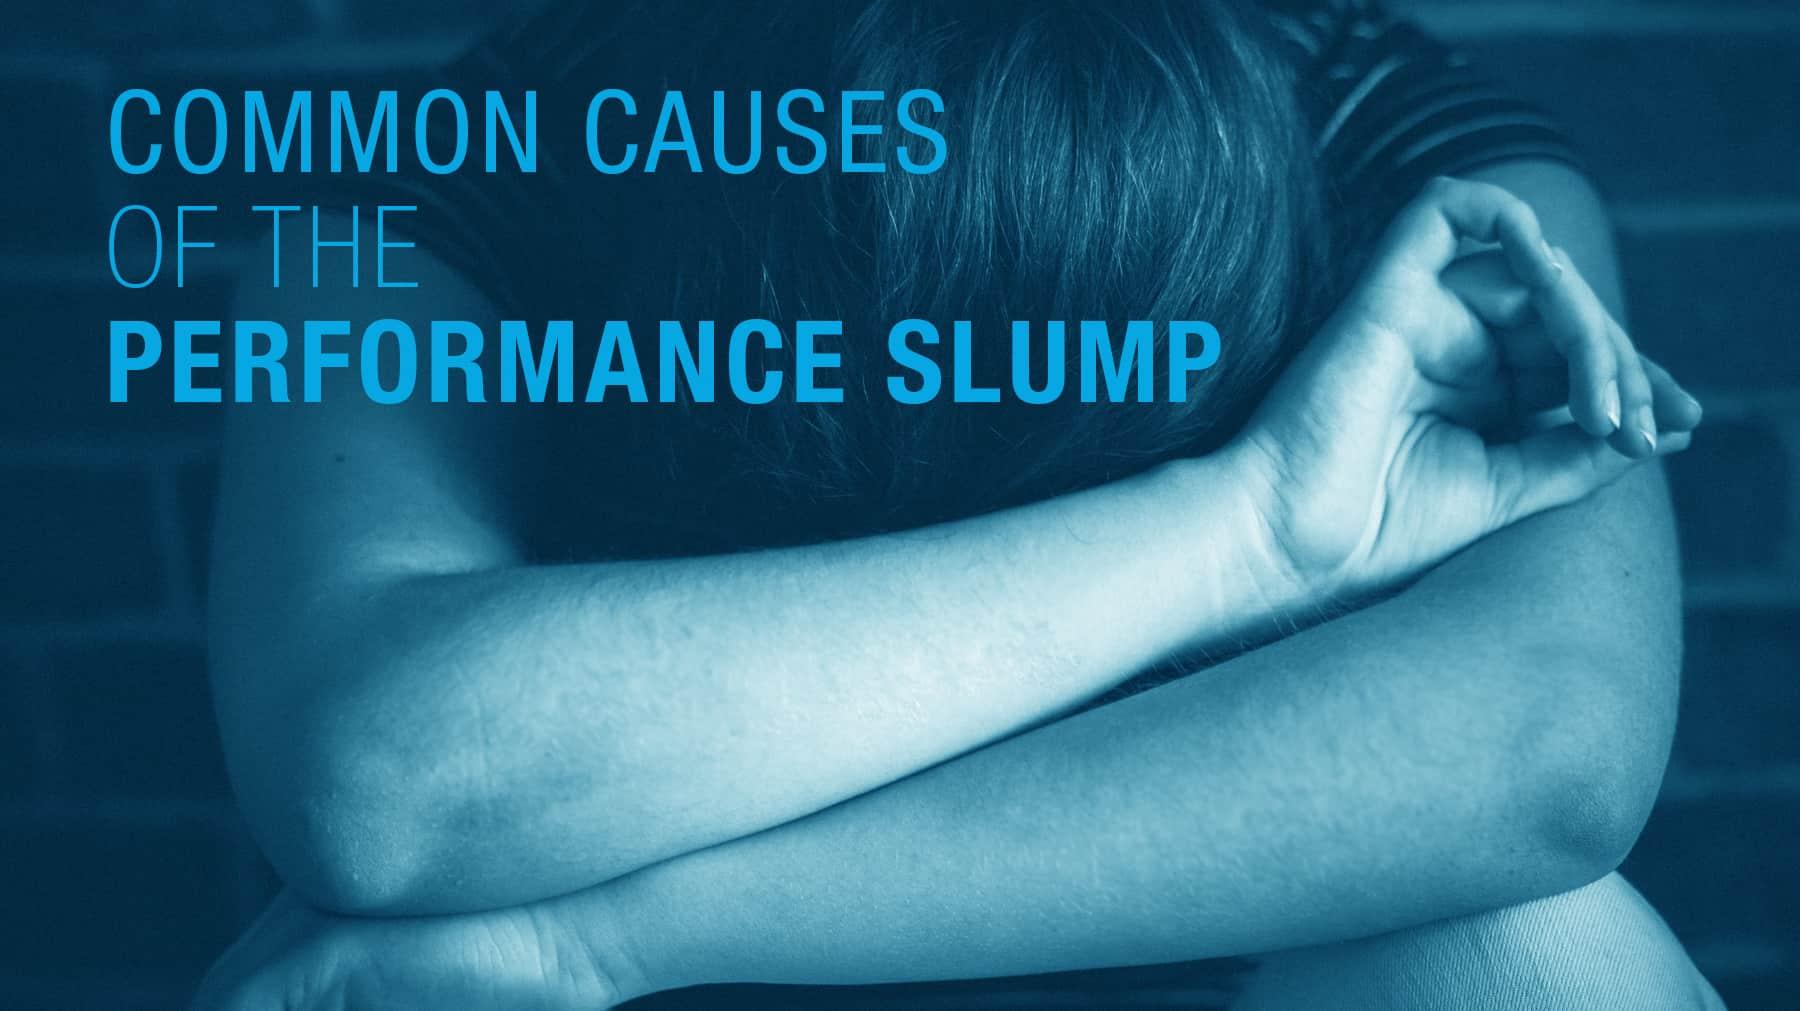 Common causes of the performance slump